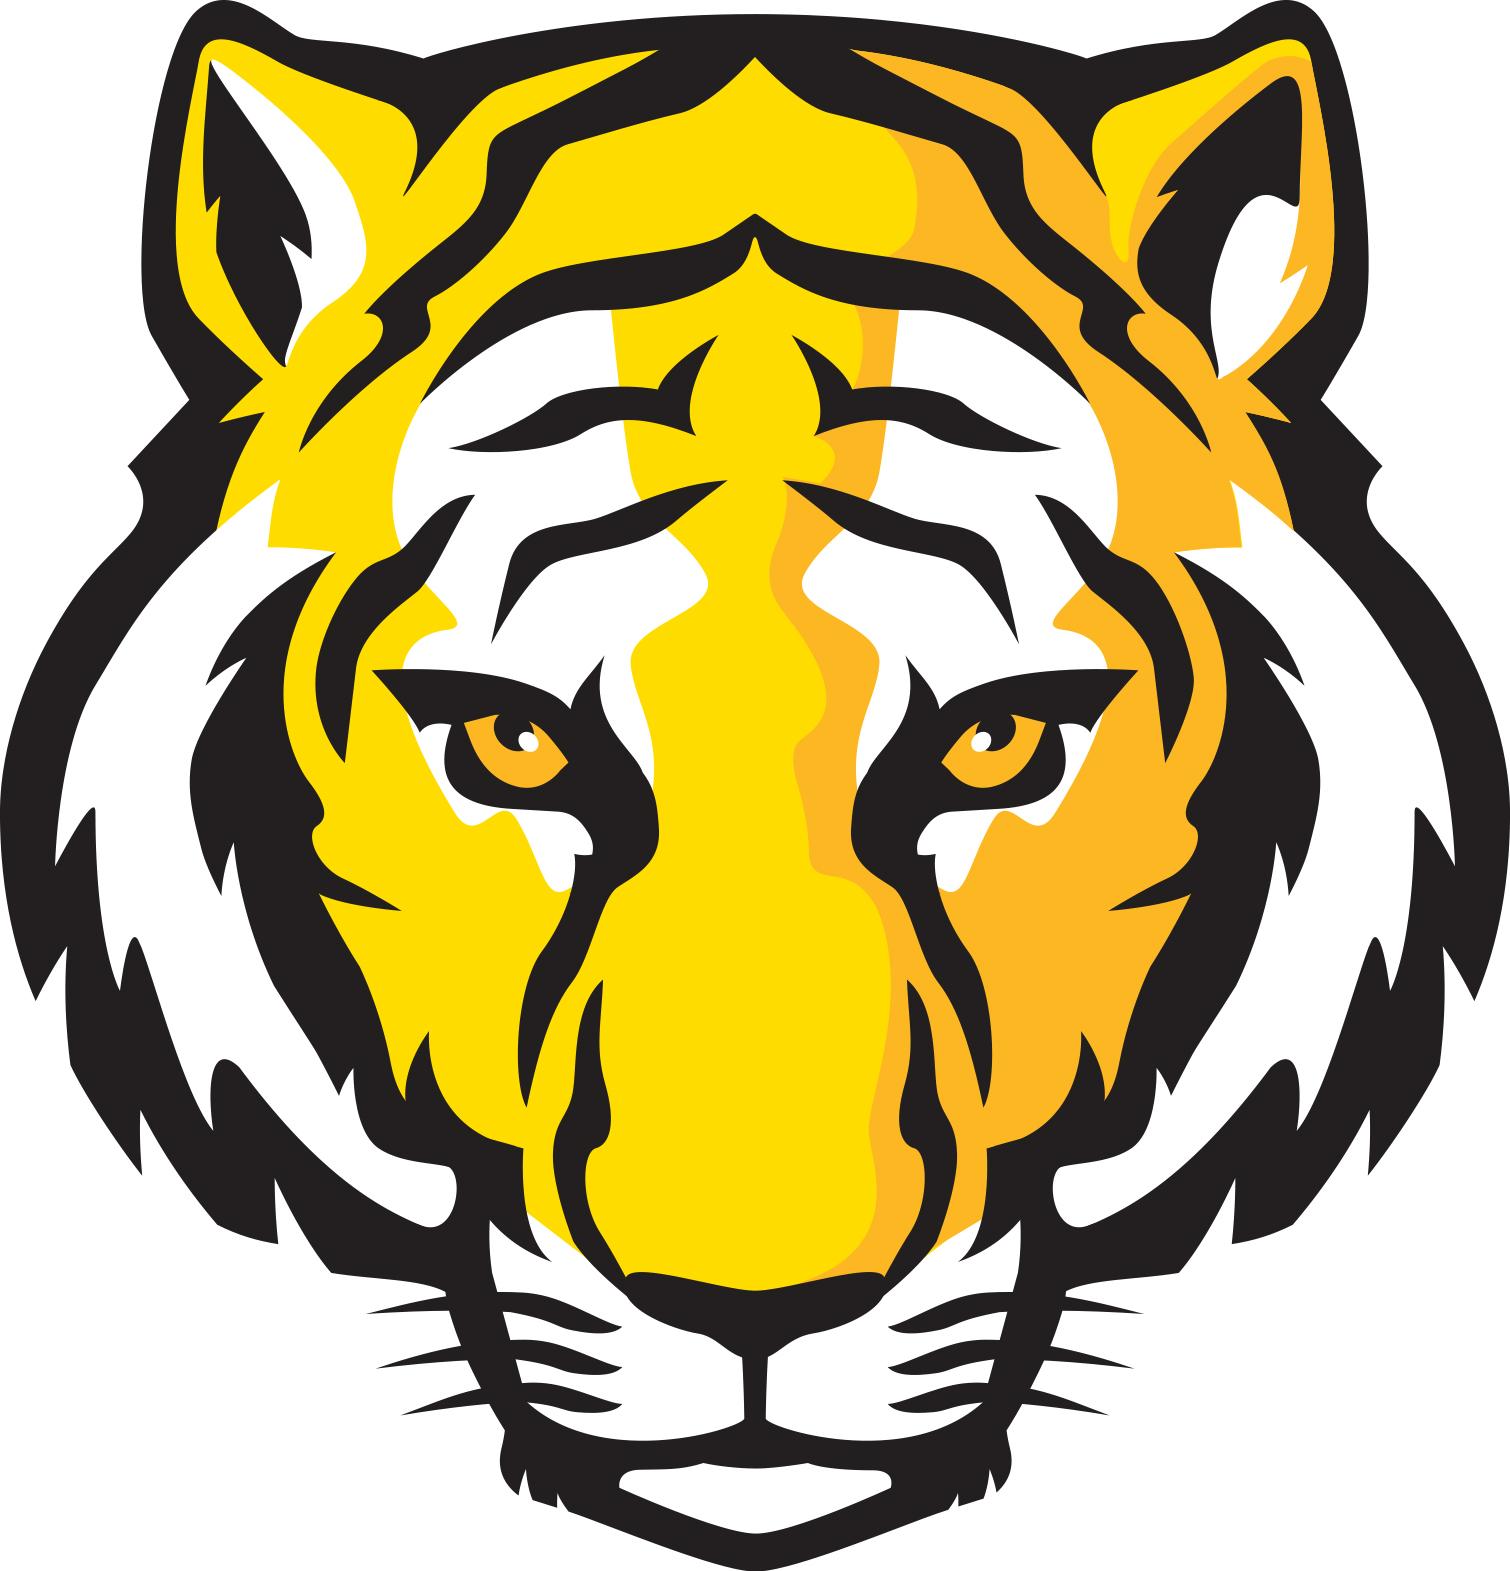 Pin By Neuzamariareisreis On Eric Carle Tiger Face Drawing Tiger Images Tiger Face